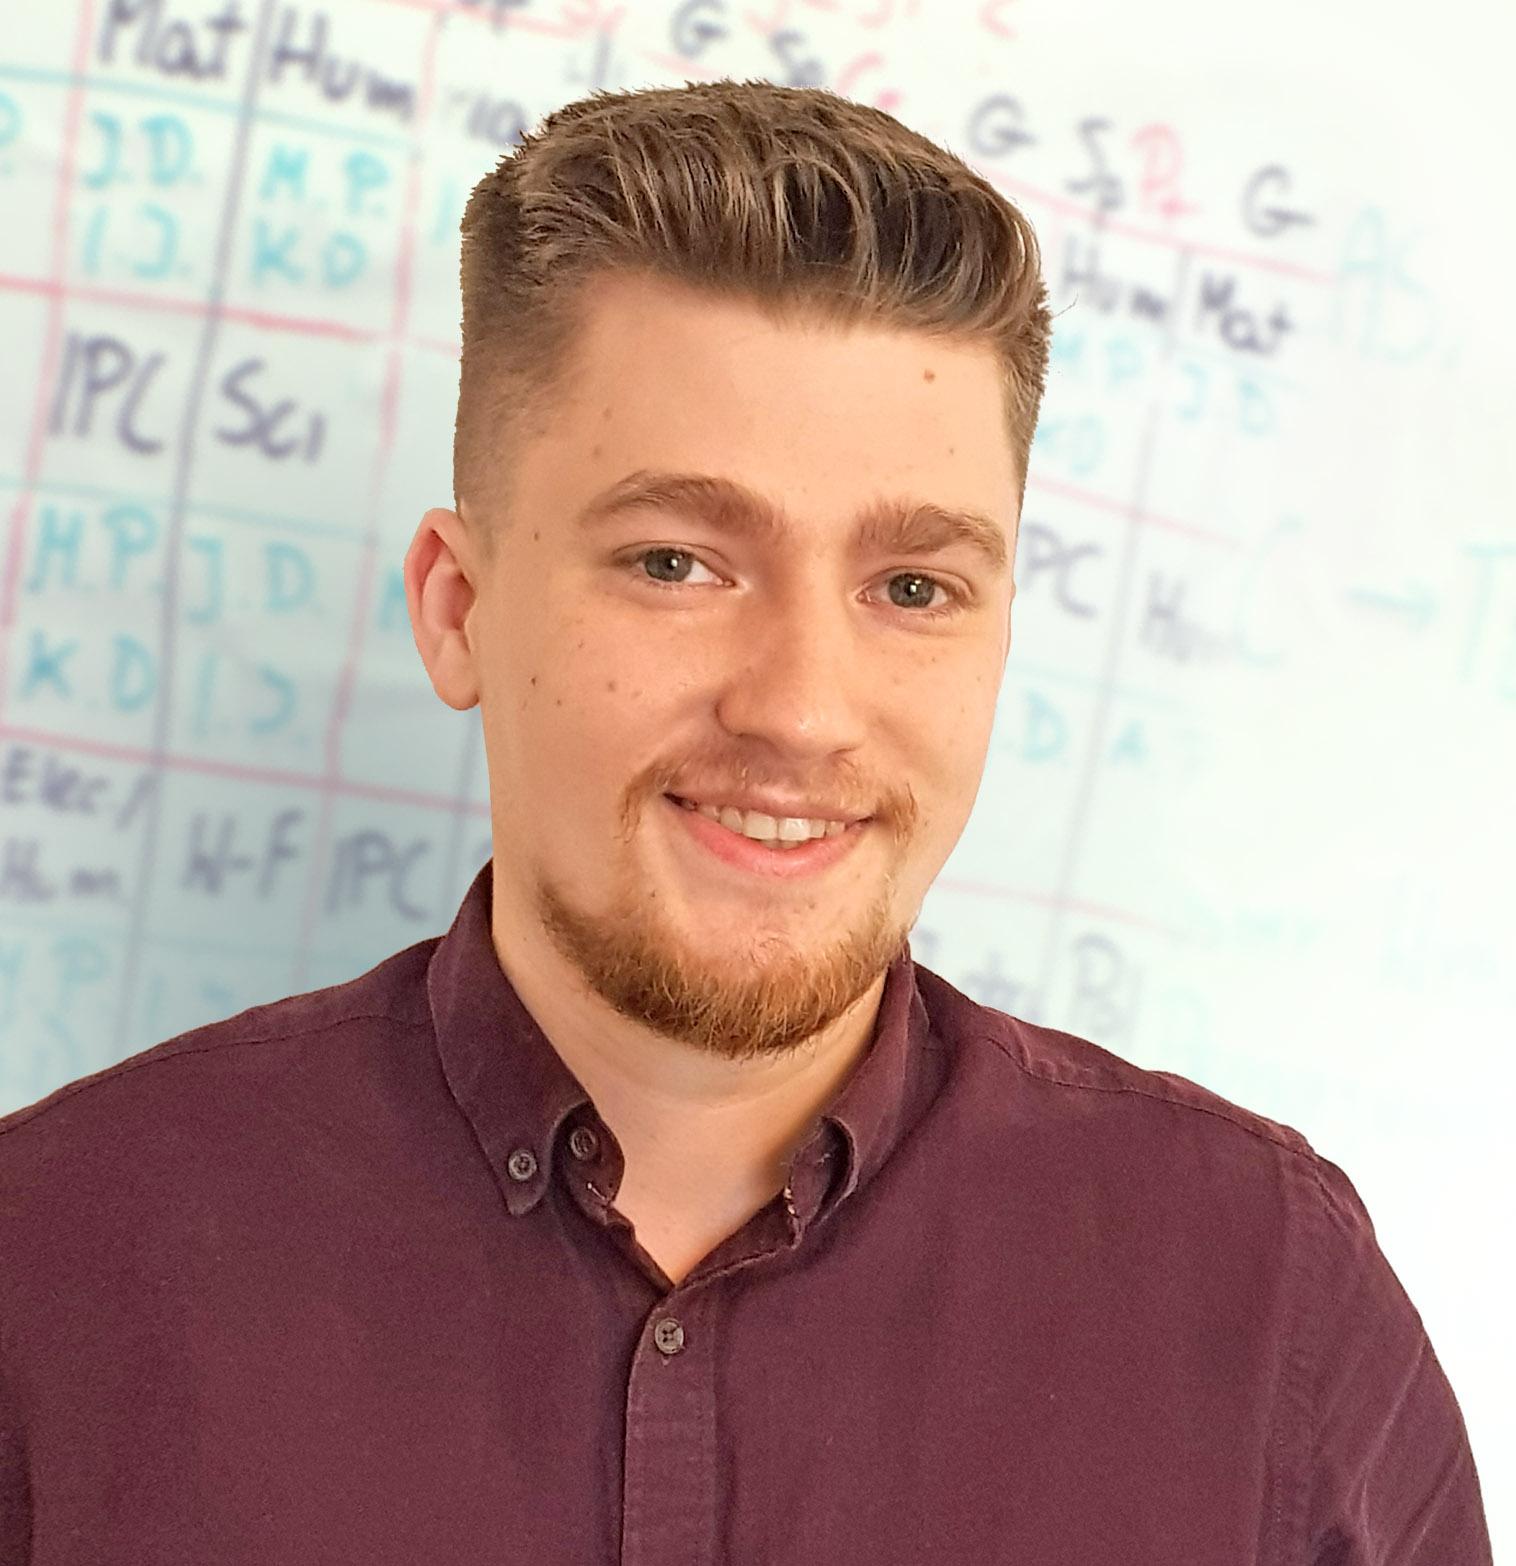 Mateusz Ryszczyński